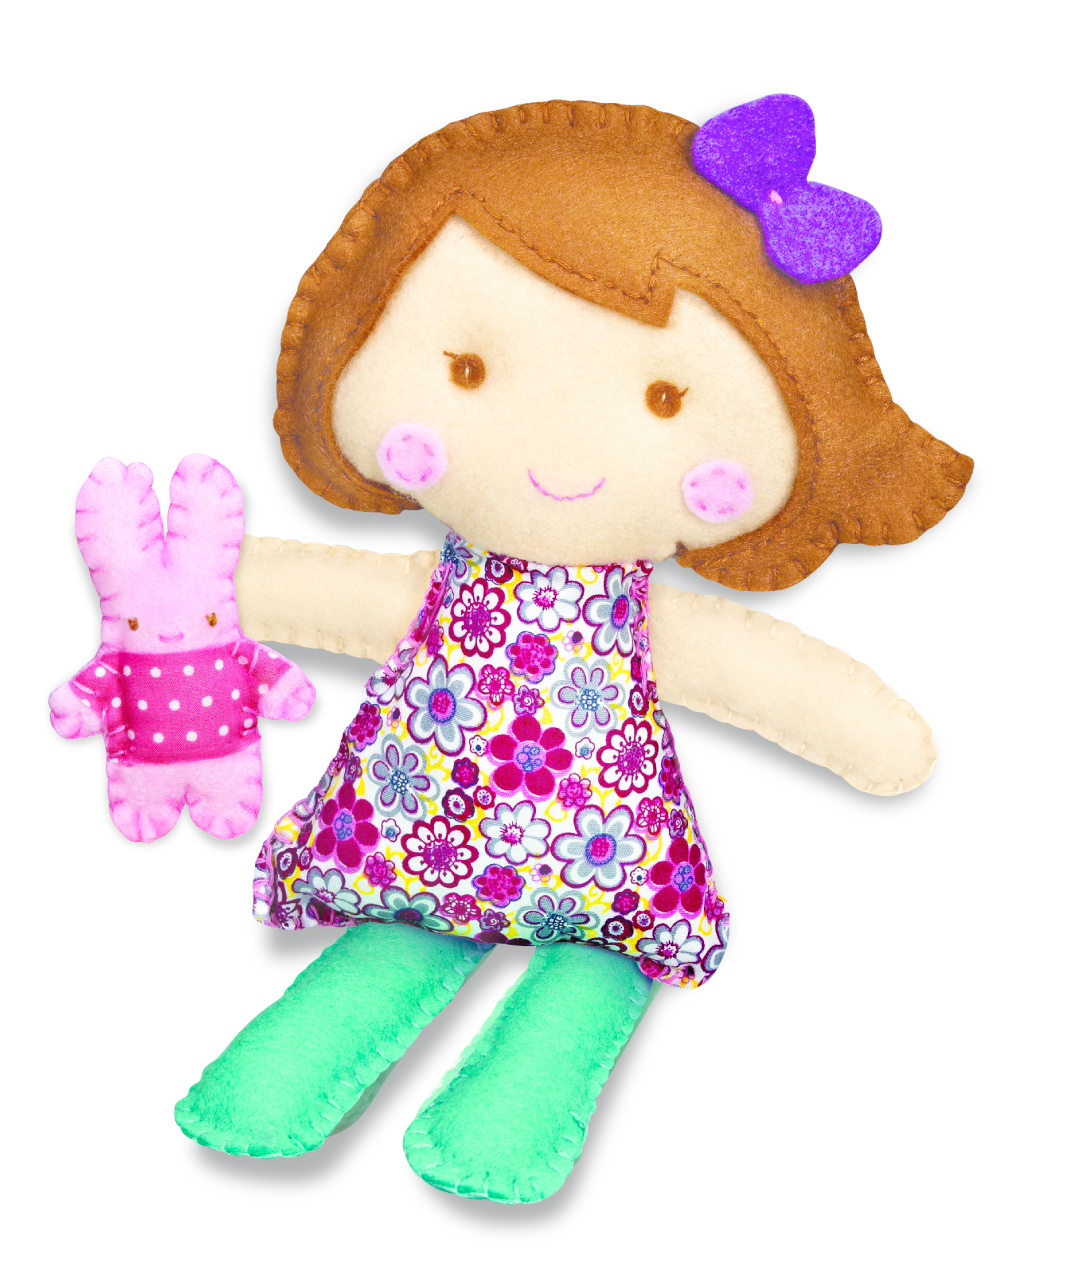 4M Stitch A Doll - Travel